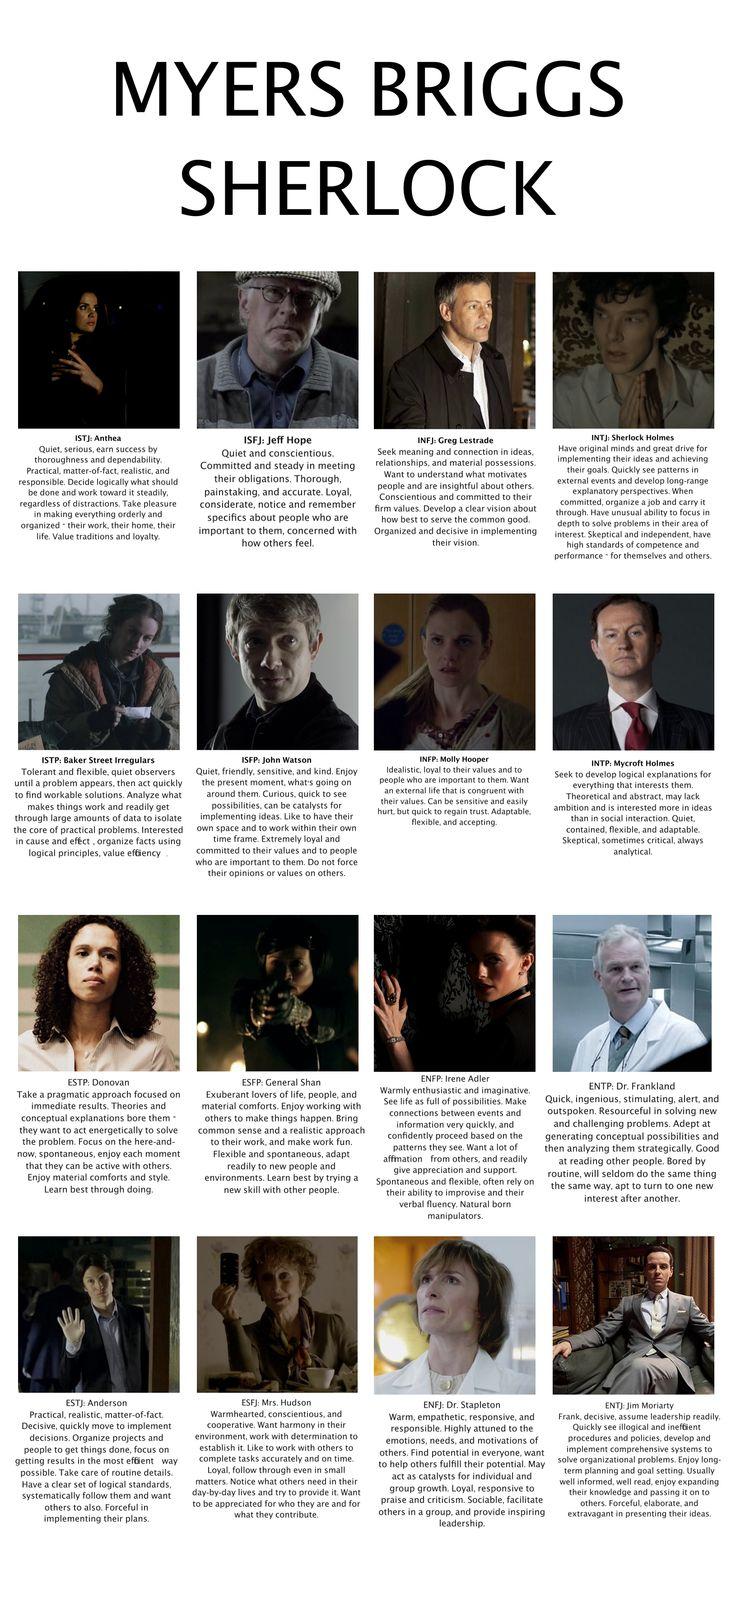 Intj Definition Of Personality Equals: Sherlock MBTI